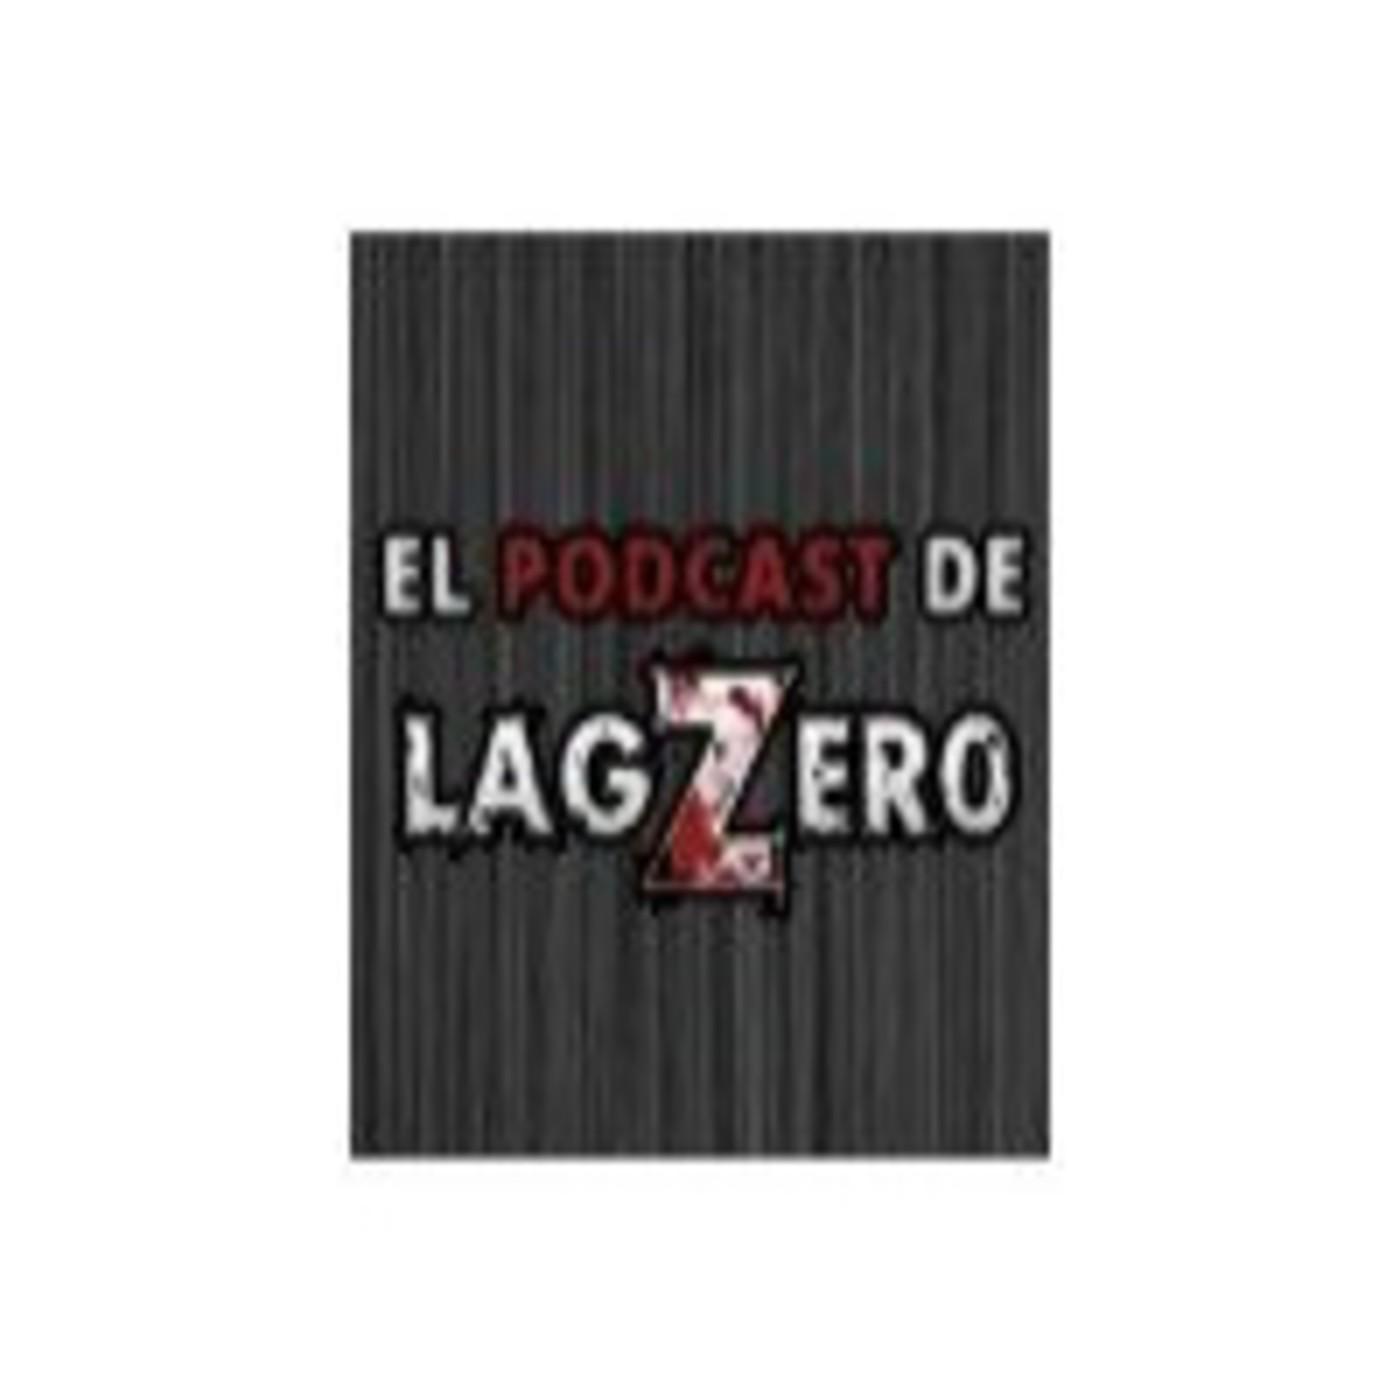 <![CDATA[Podcast El podcast de Lagzero]]>